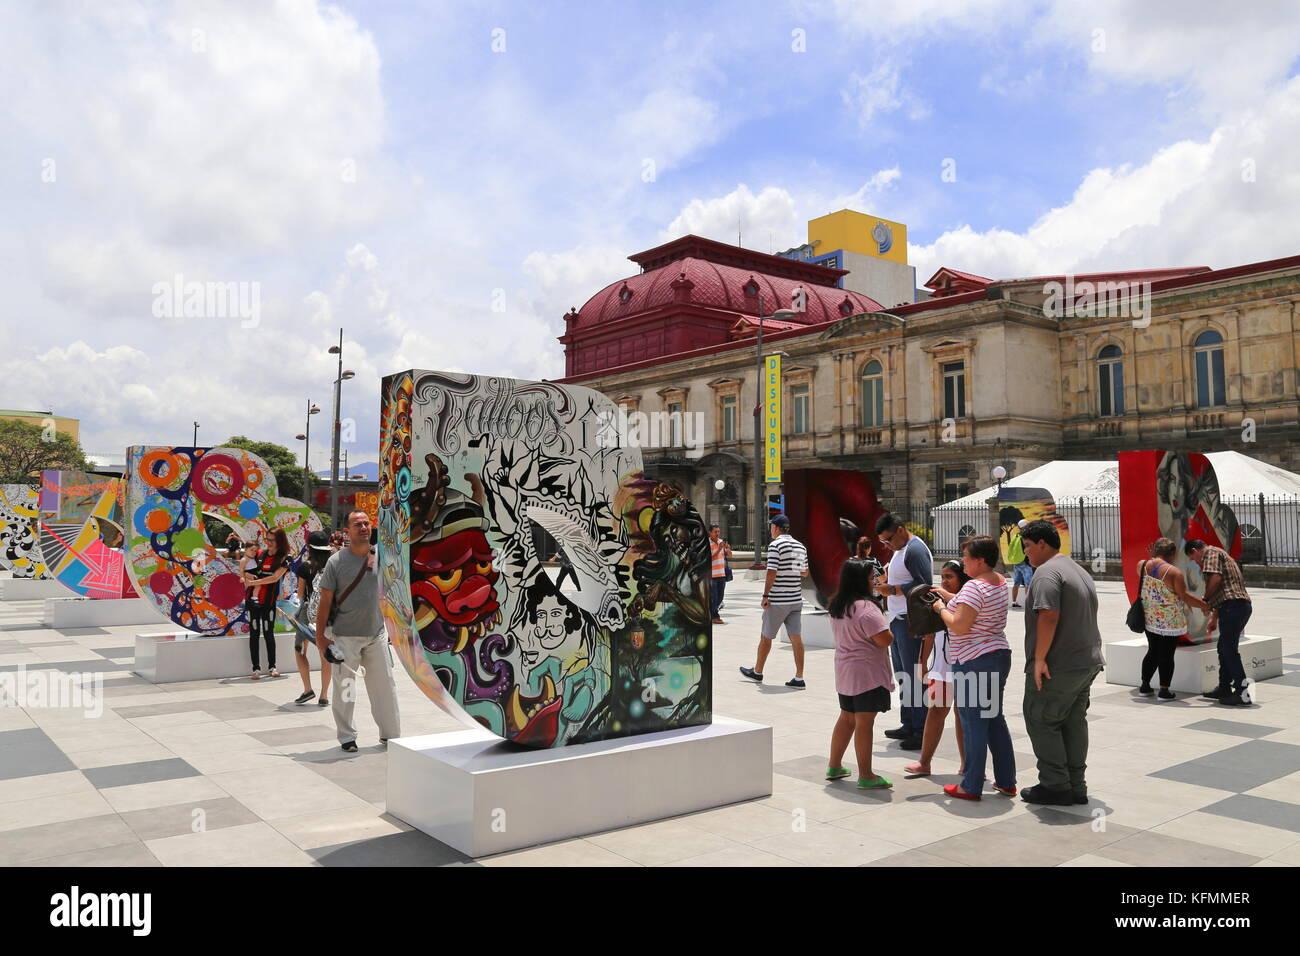 Plaza de la Cultura, Avenida Central, San José, San José province, Central Highlands, Costa Rica, Central - Stock Image